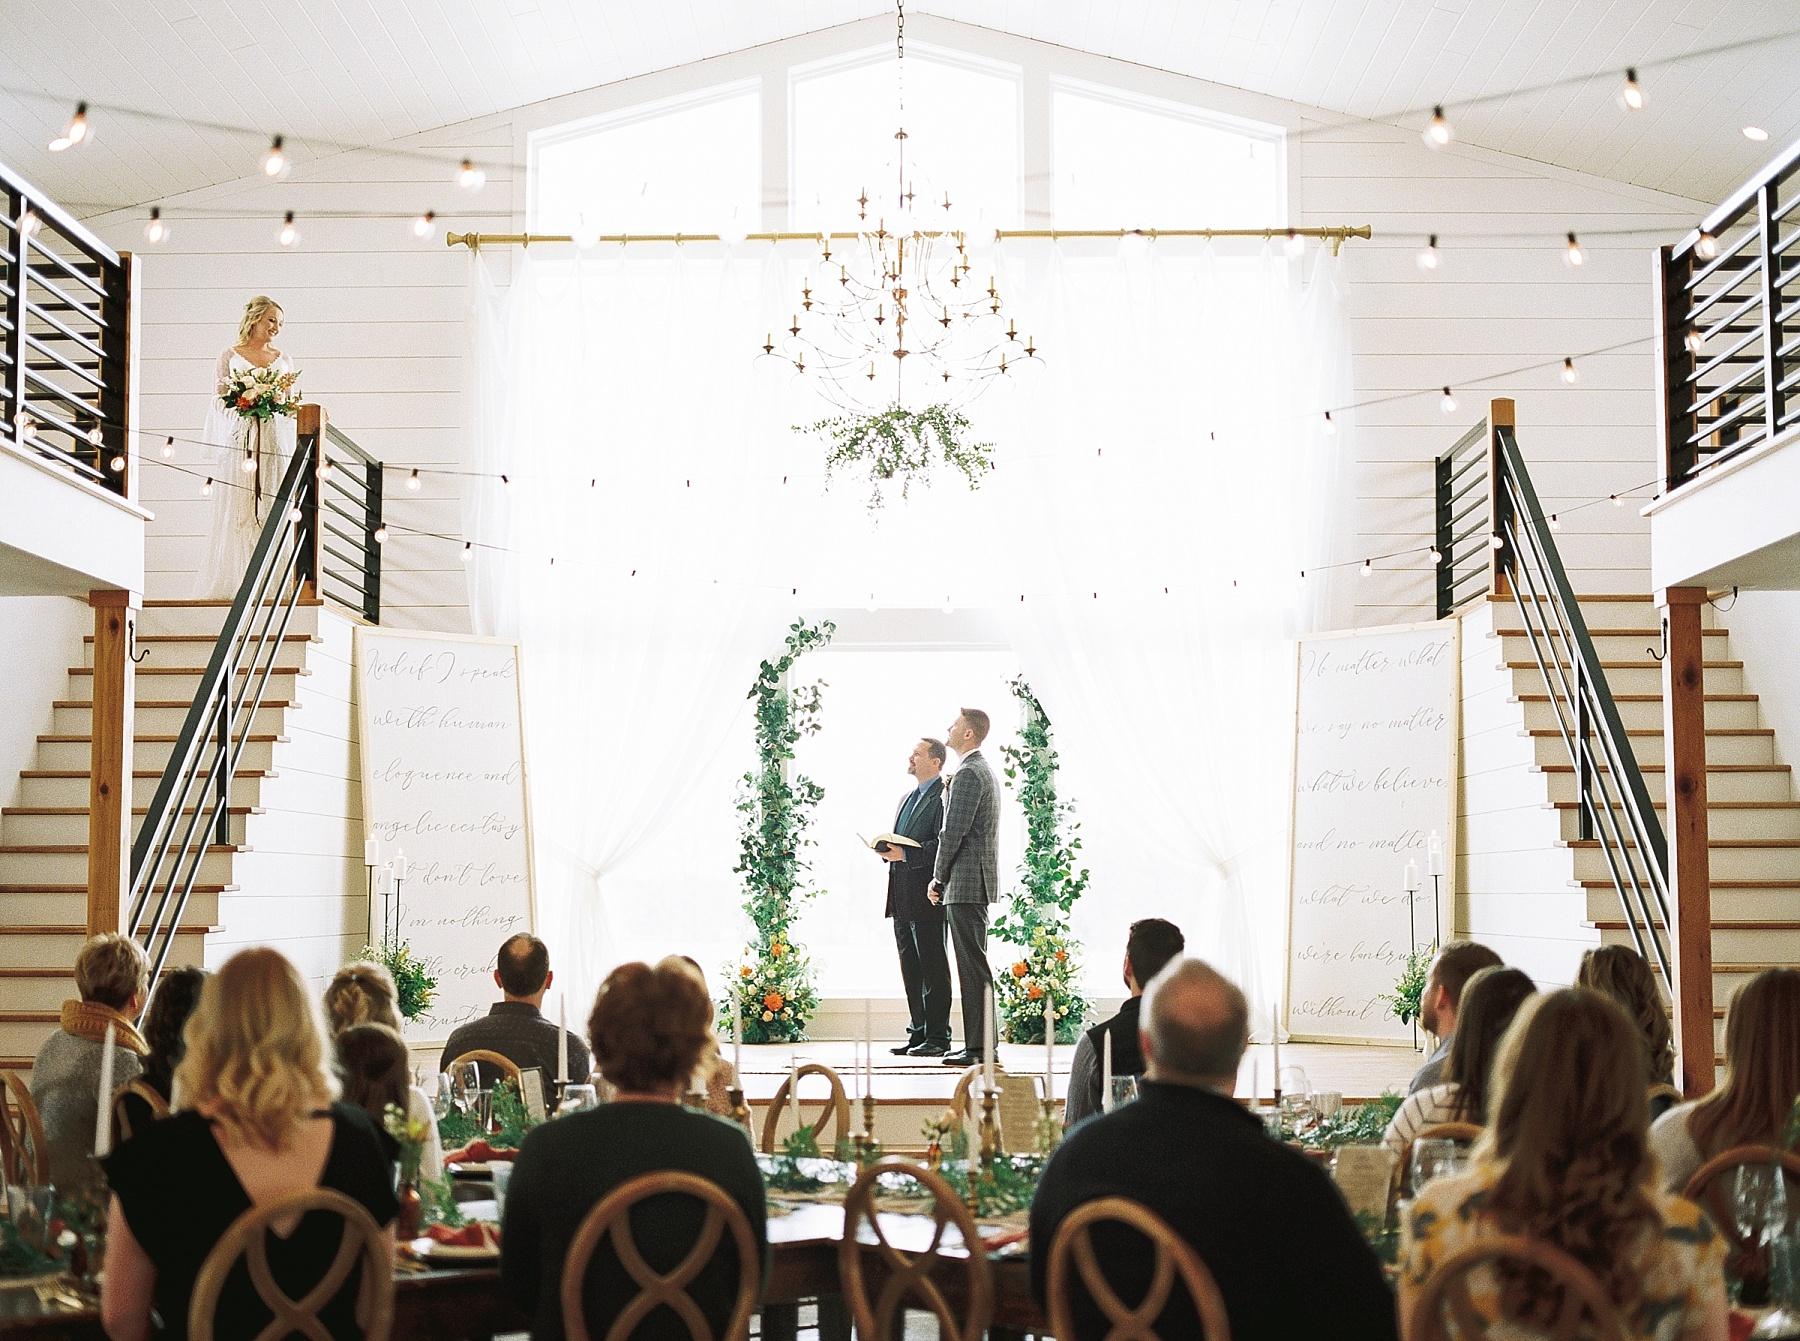 Eclectic Scandinavian Winter Wedding in All White Venue Emerson Fields by Kelsi Kliethermes Photography Best Missouri and Maui Wedding Photographer_0004.jpg